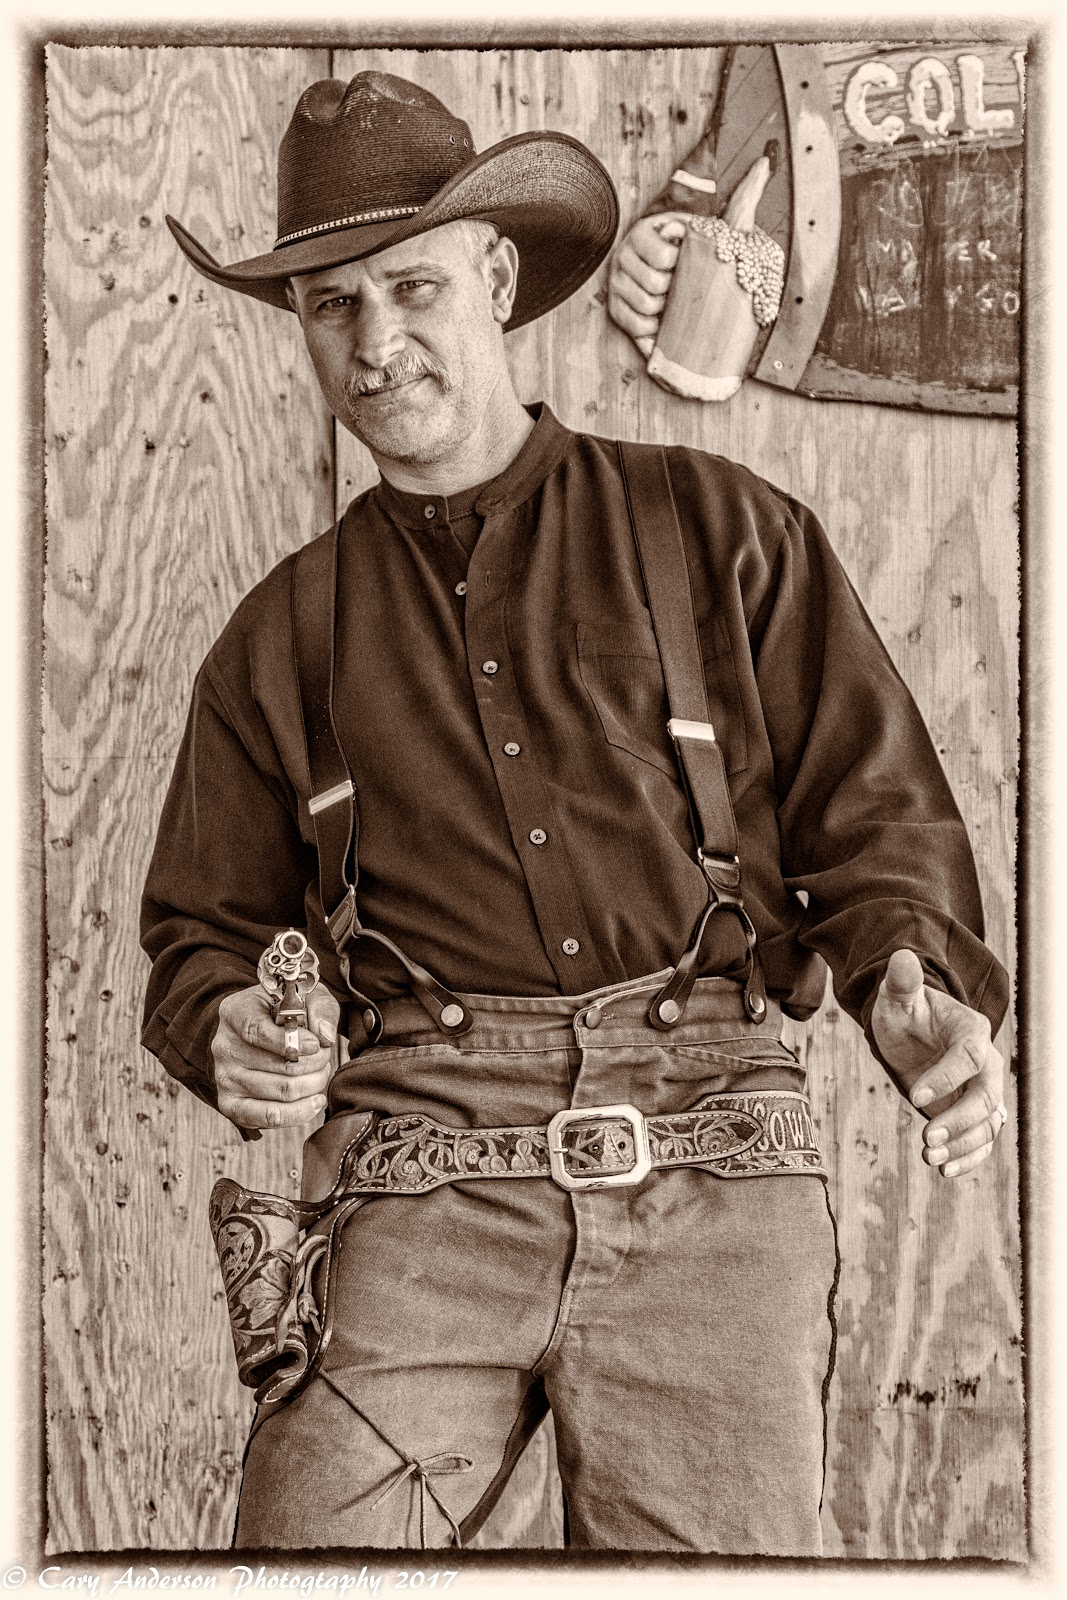 Cowboy up President